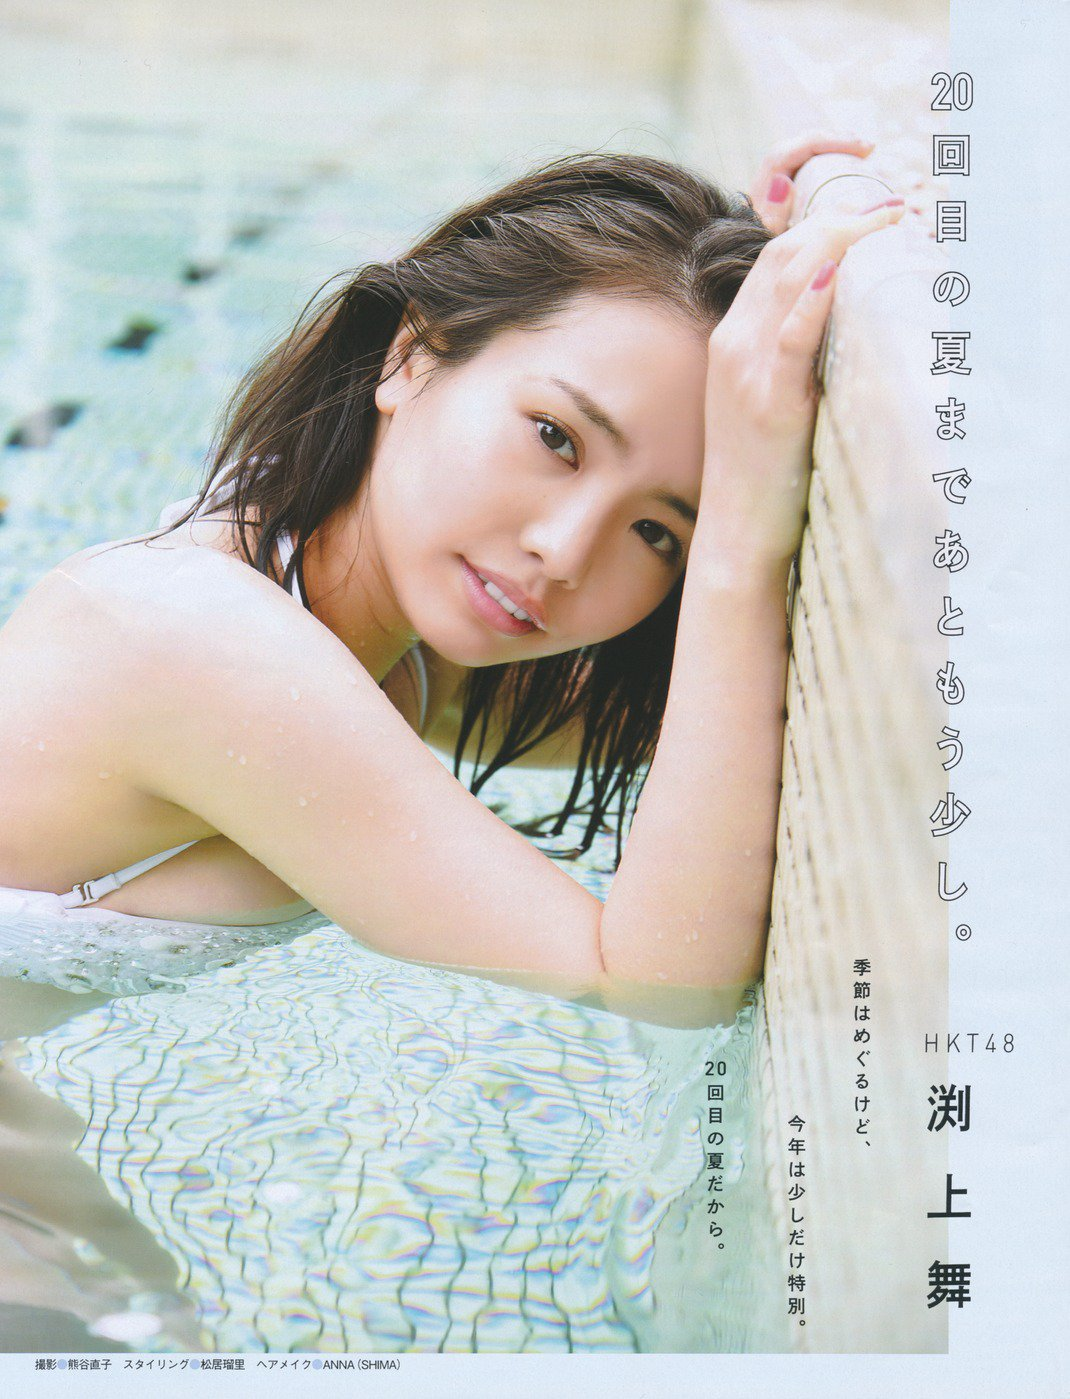 Fuchigami Mai 渕上舞 HKT48, Ex-Taishu 2017.06 (EX大衆 2017年06月号)